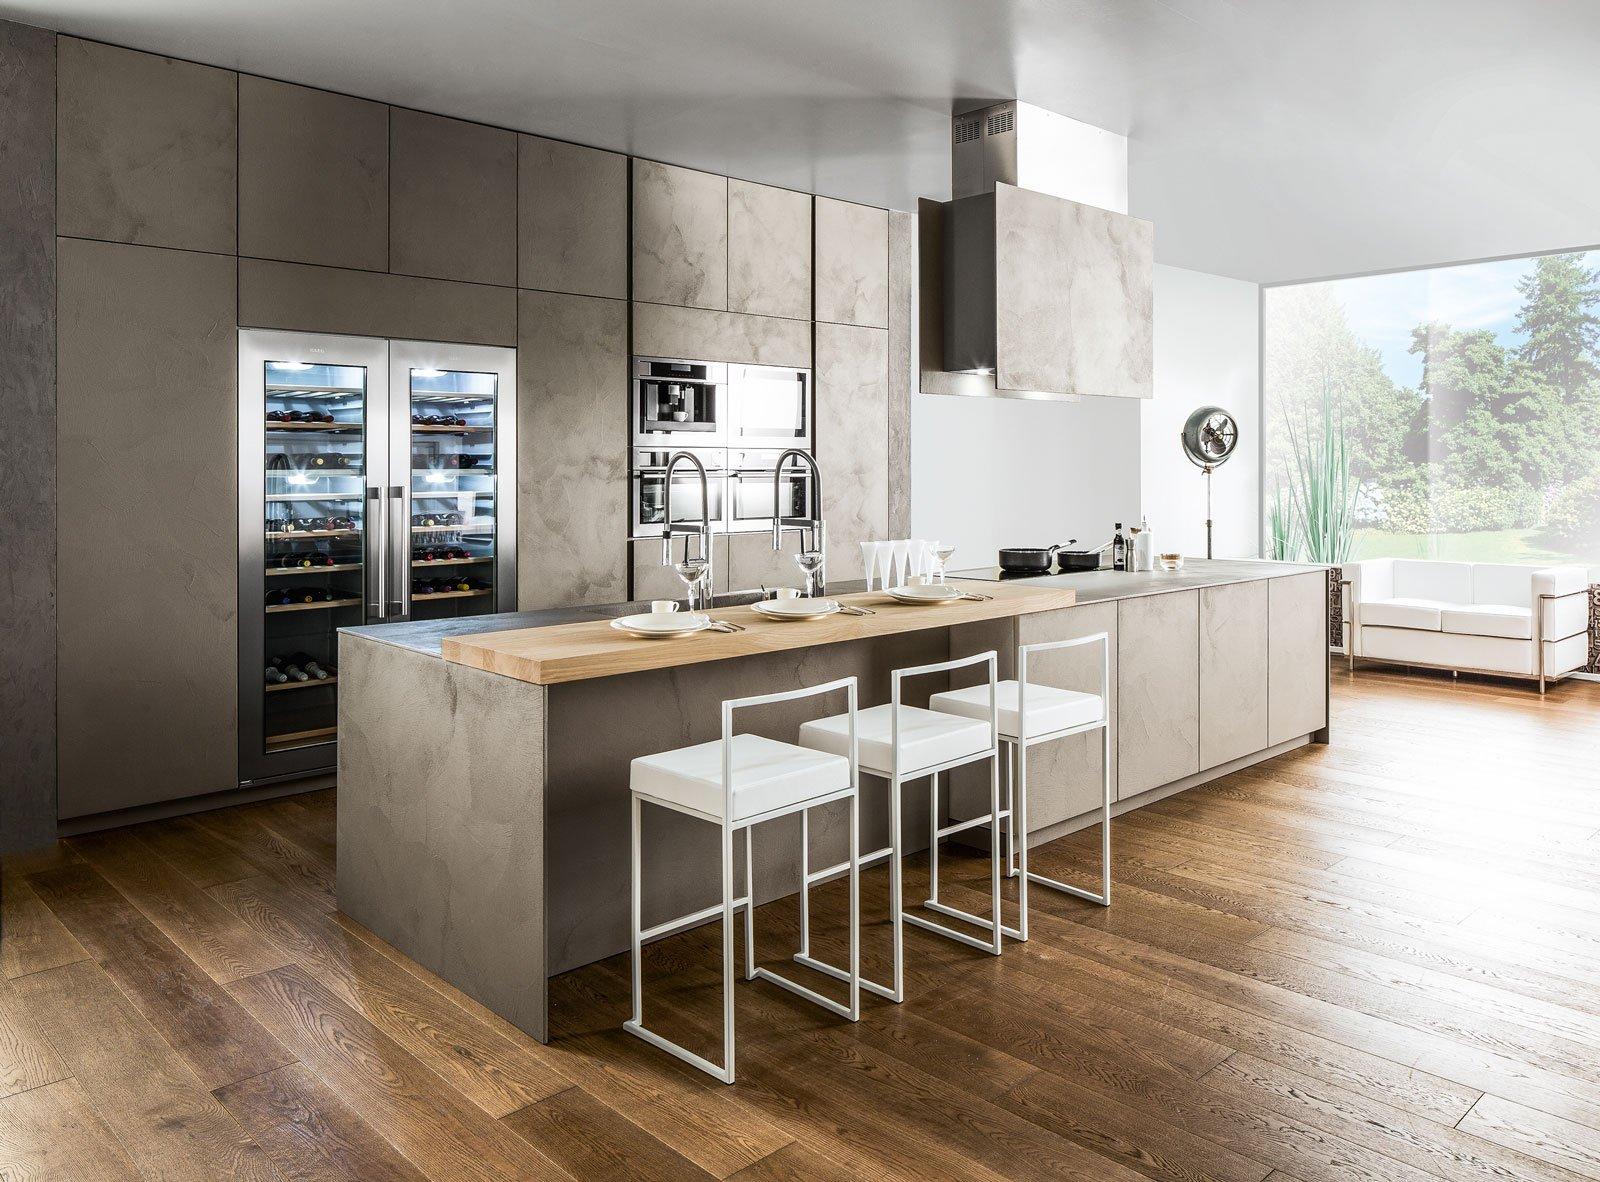 Cucine con cappa decorativa cose di casa - Arrex cucine moderne ...